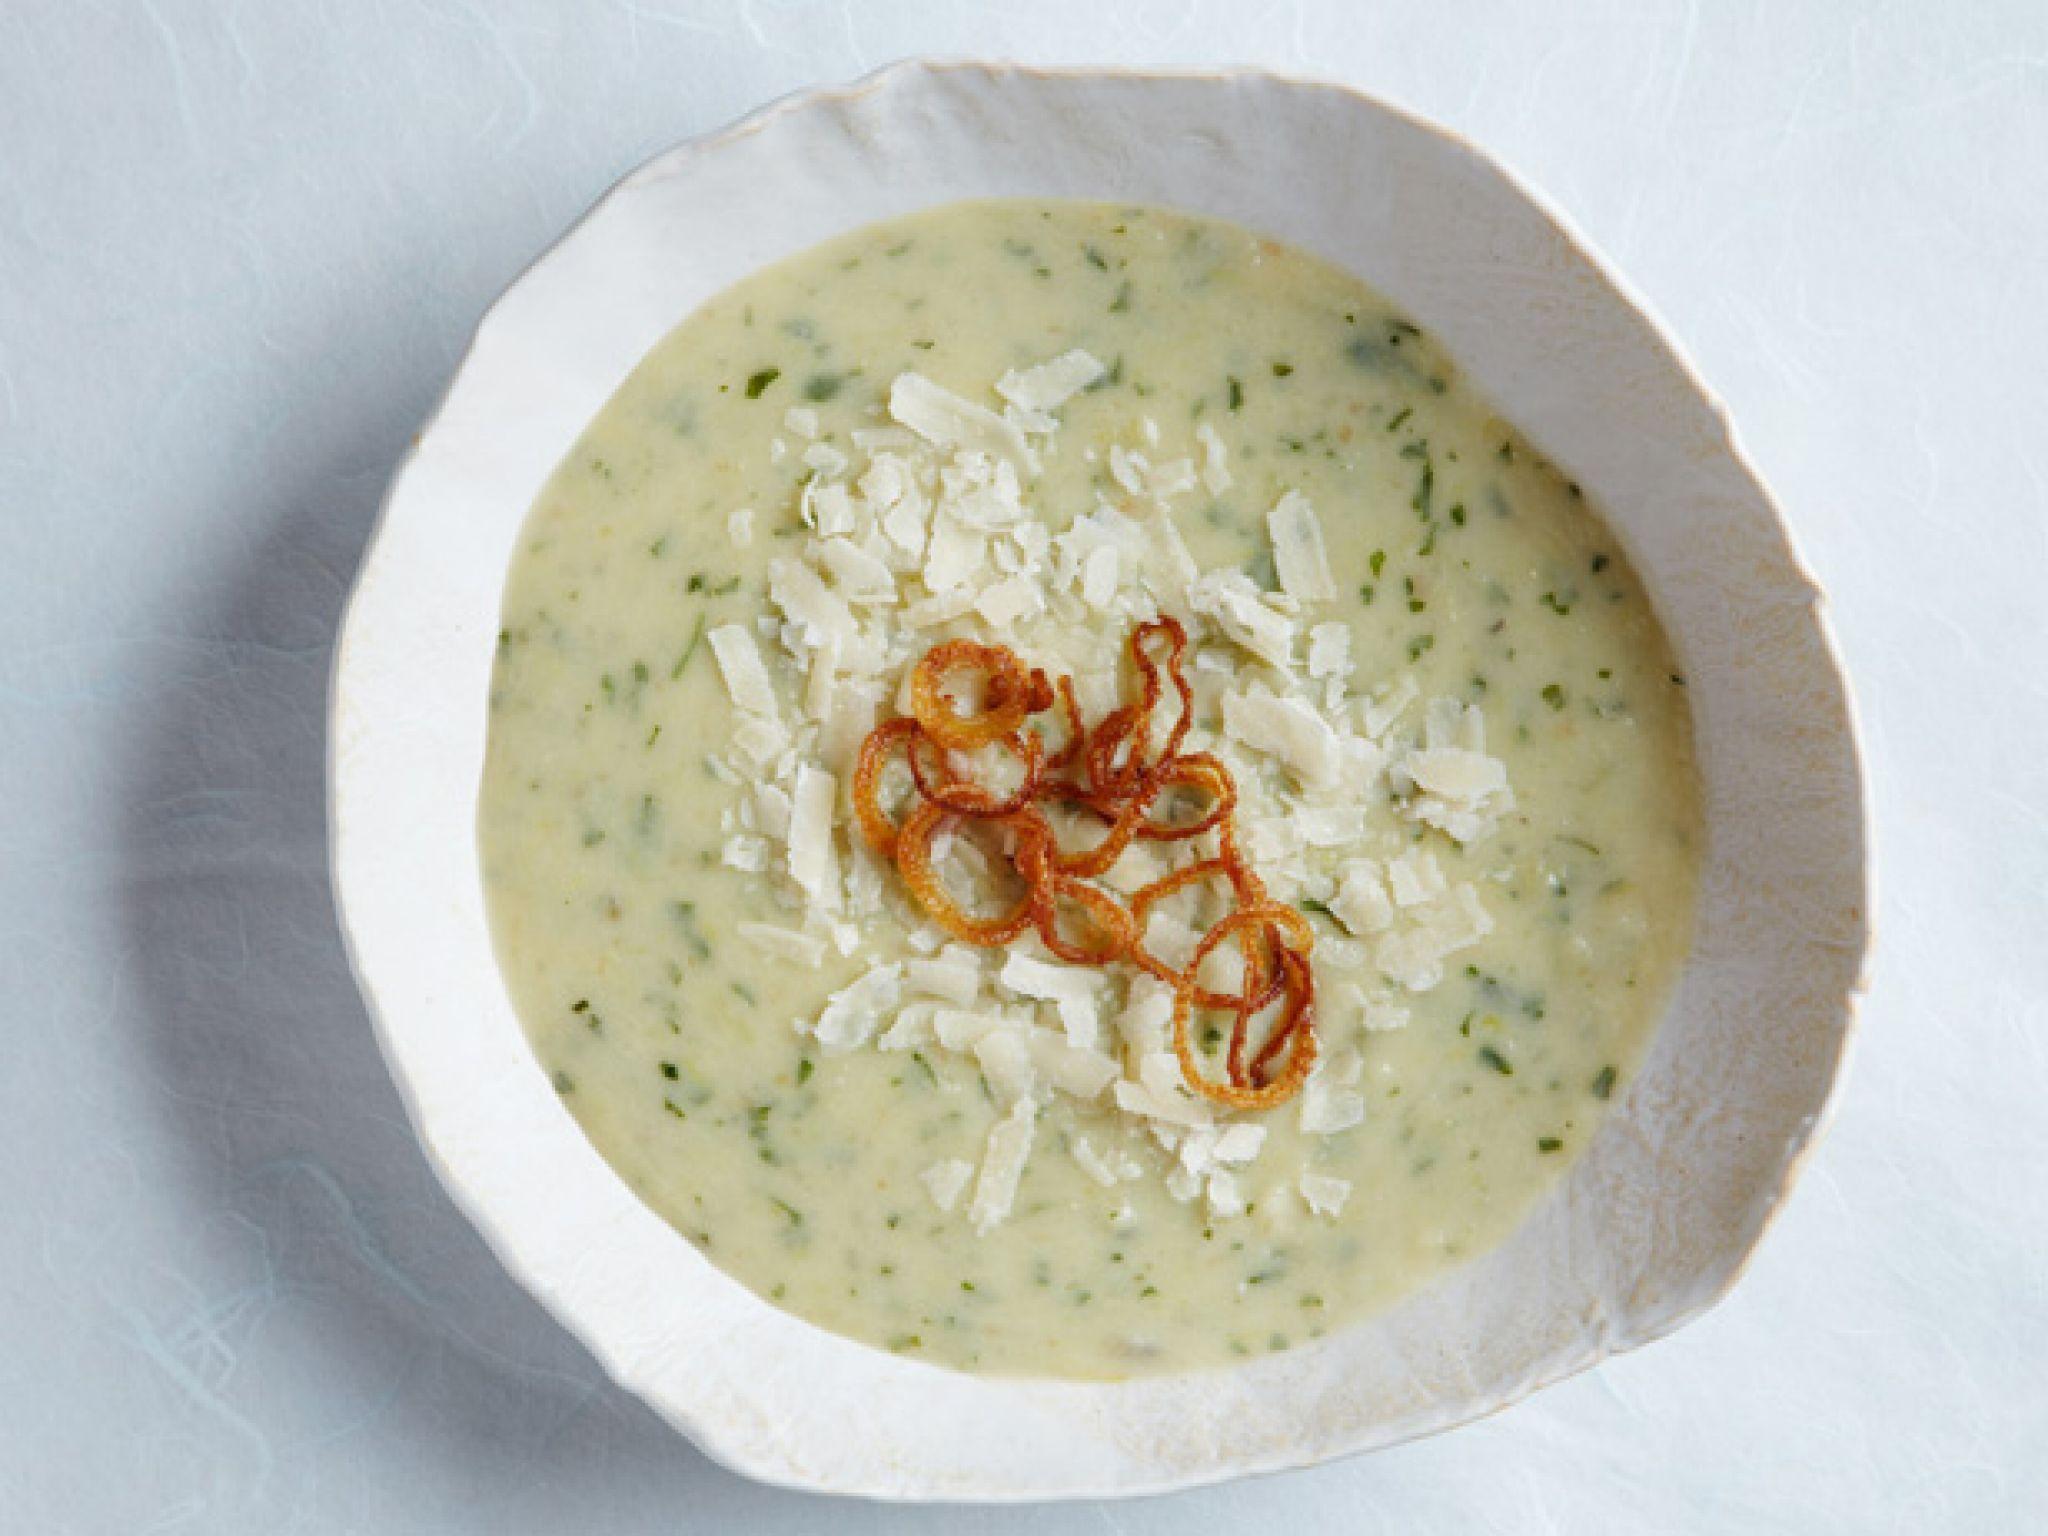 Ina Garten Soup Check Out Roasted Potato Leek Soupit's So Easy To Make  Potato